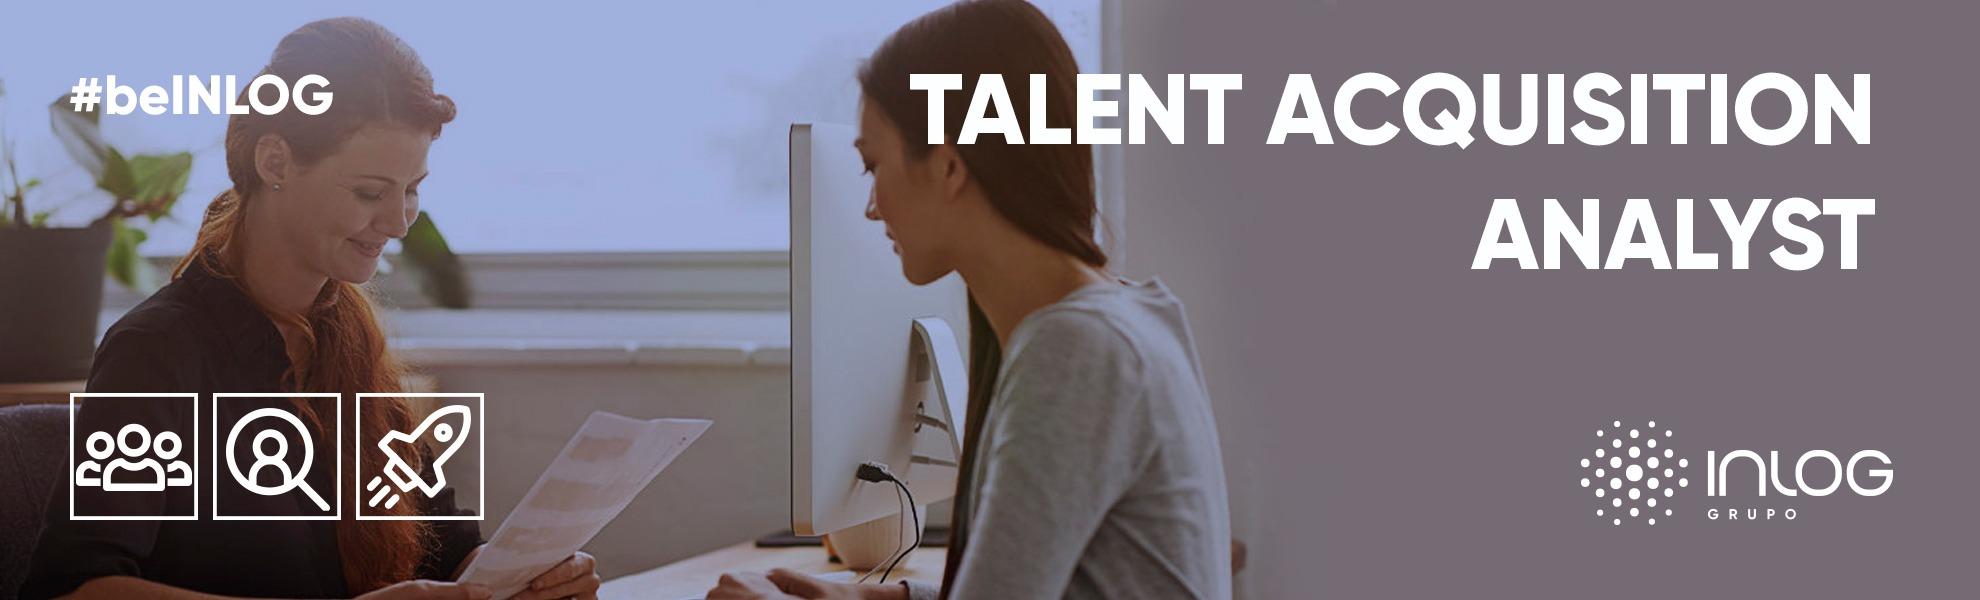 Talent Acquisition Analyst